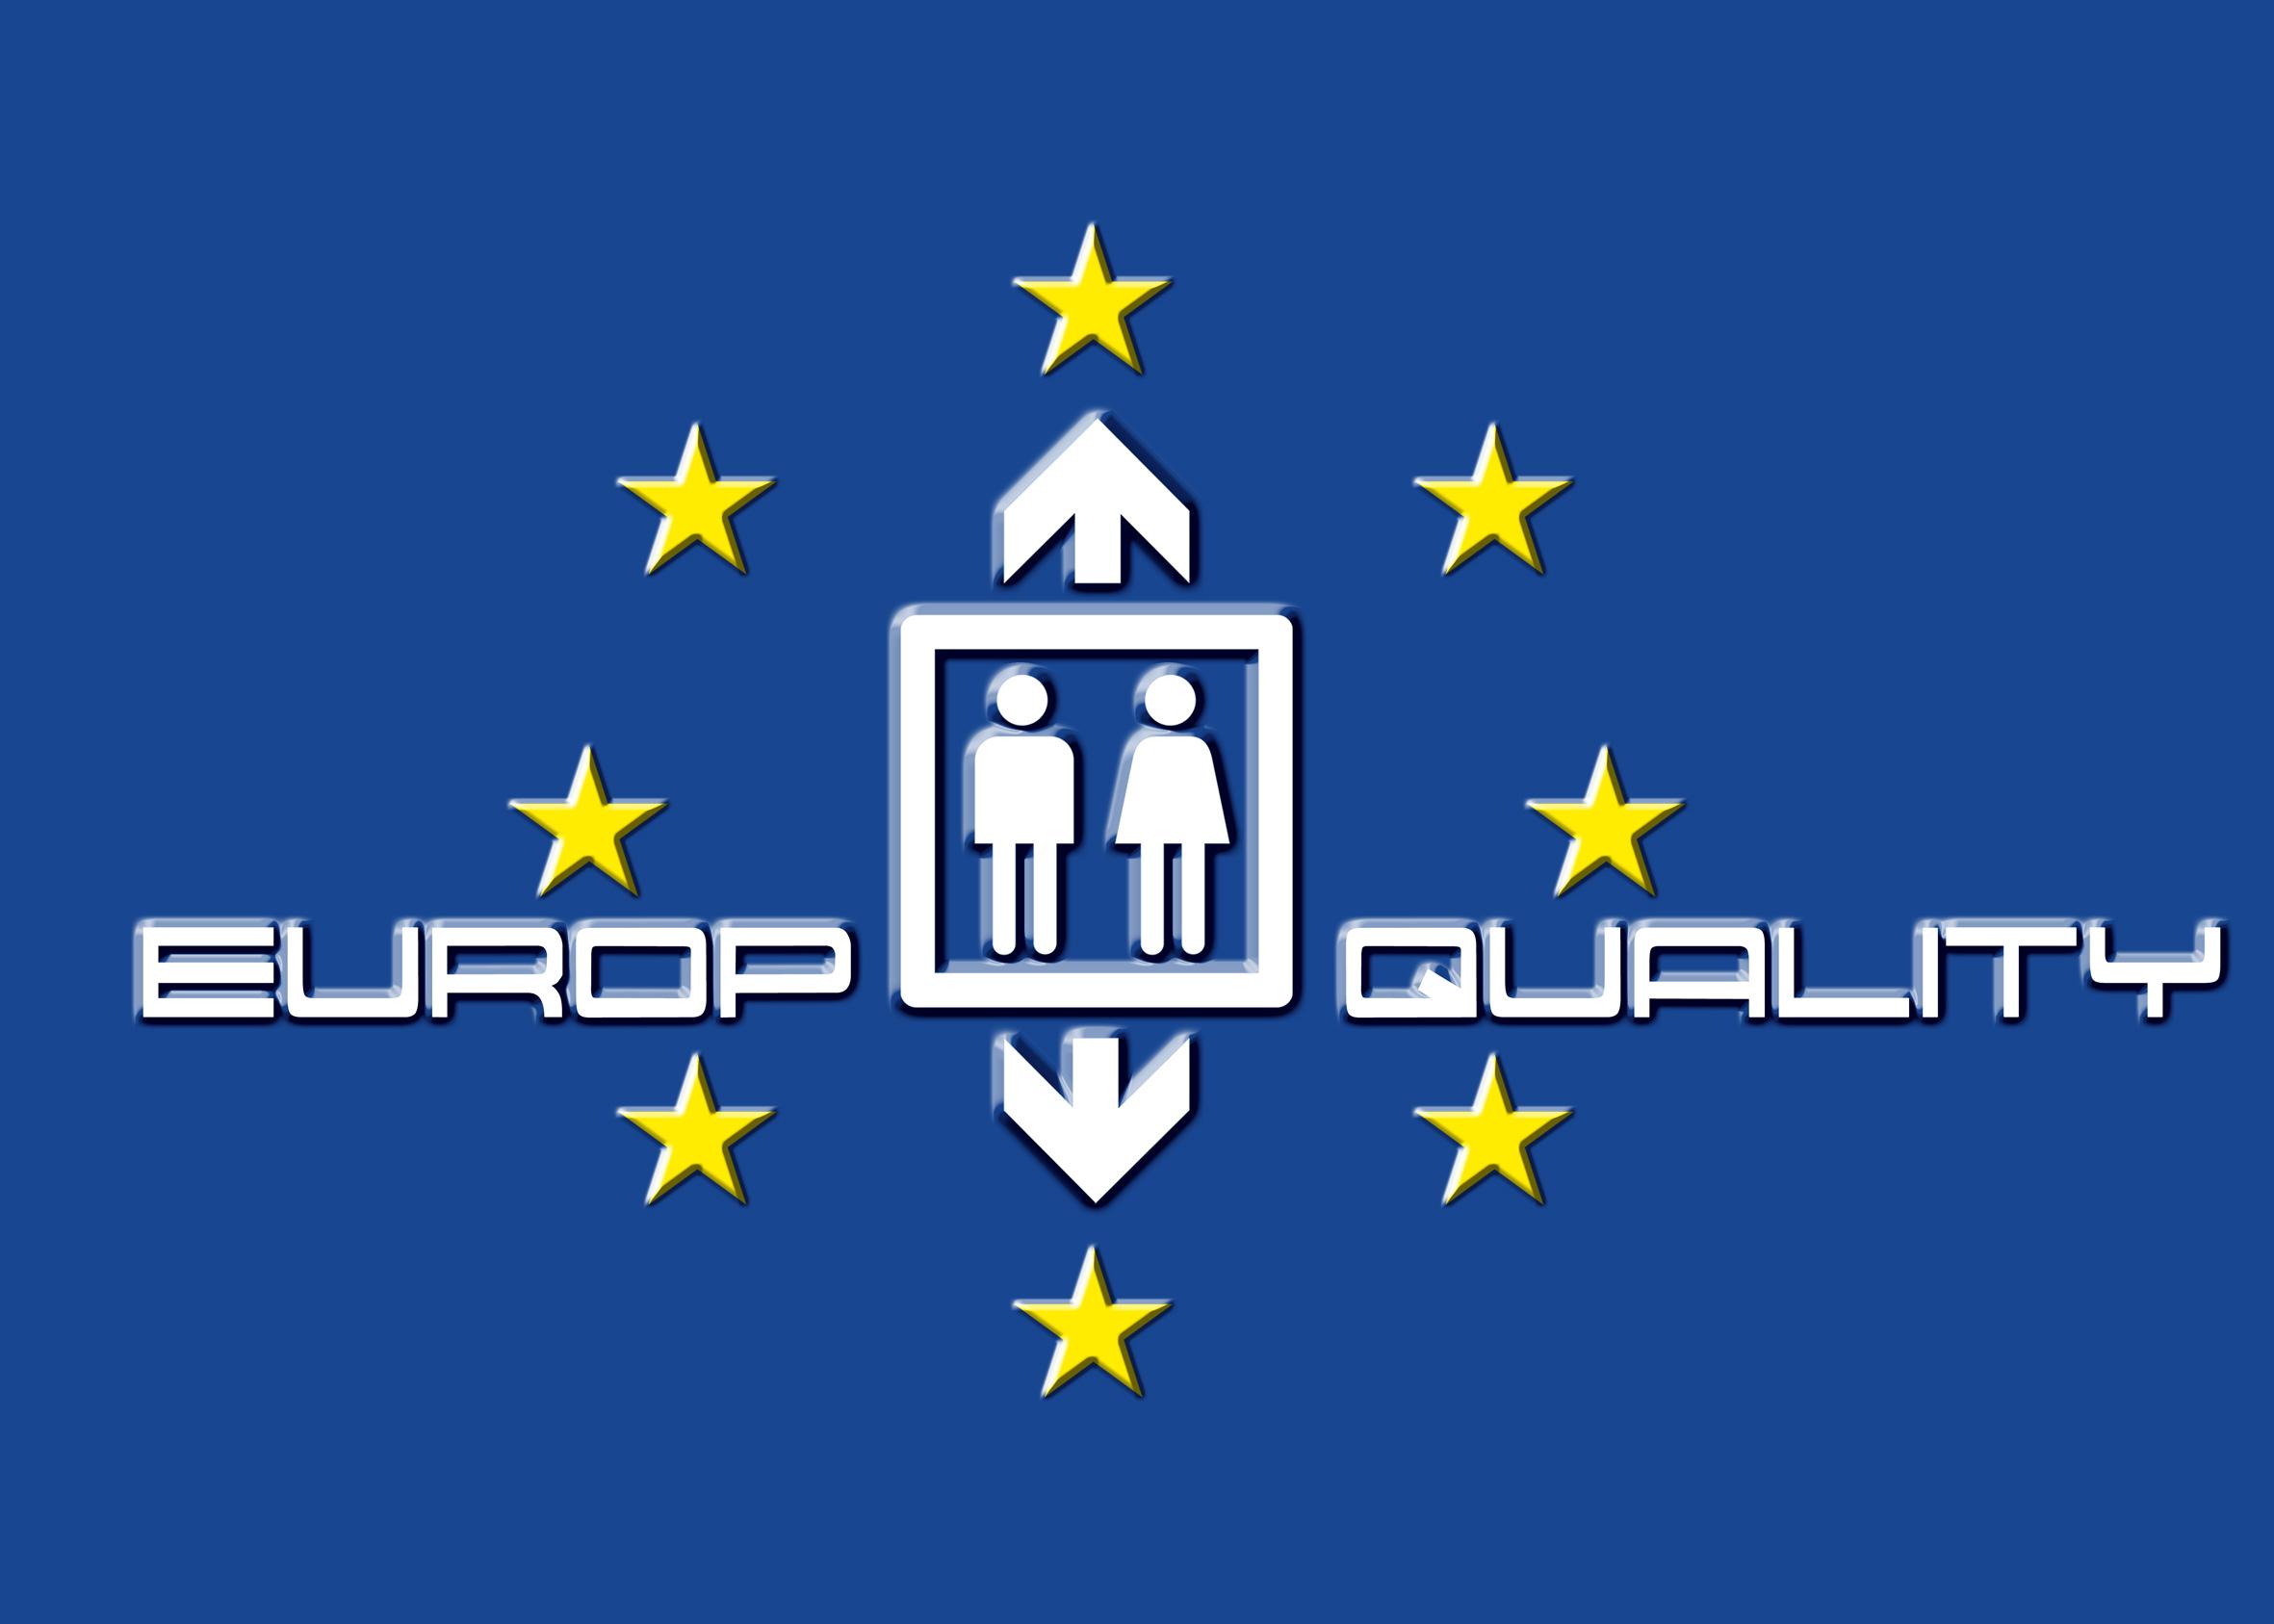 EUROP QUALITY ELEVATORS SL